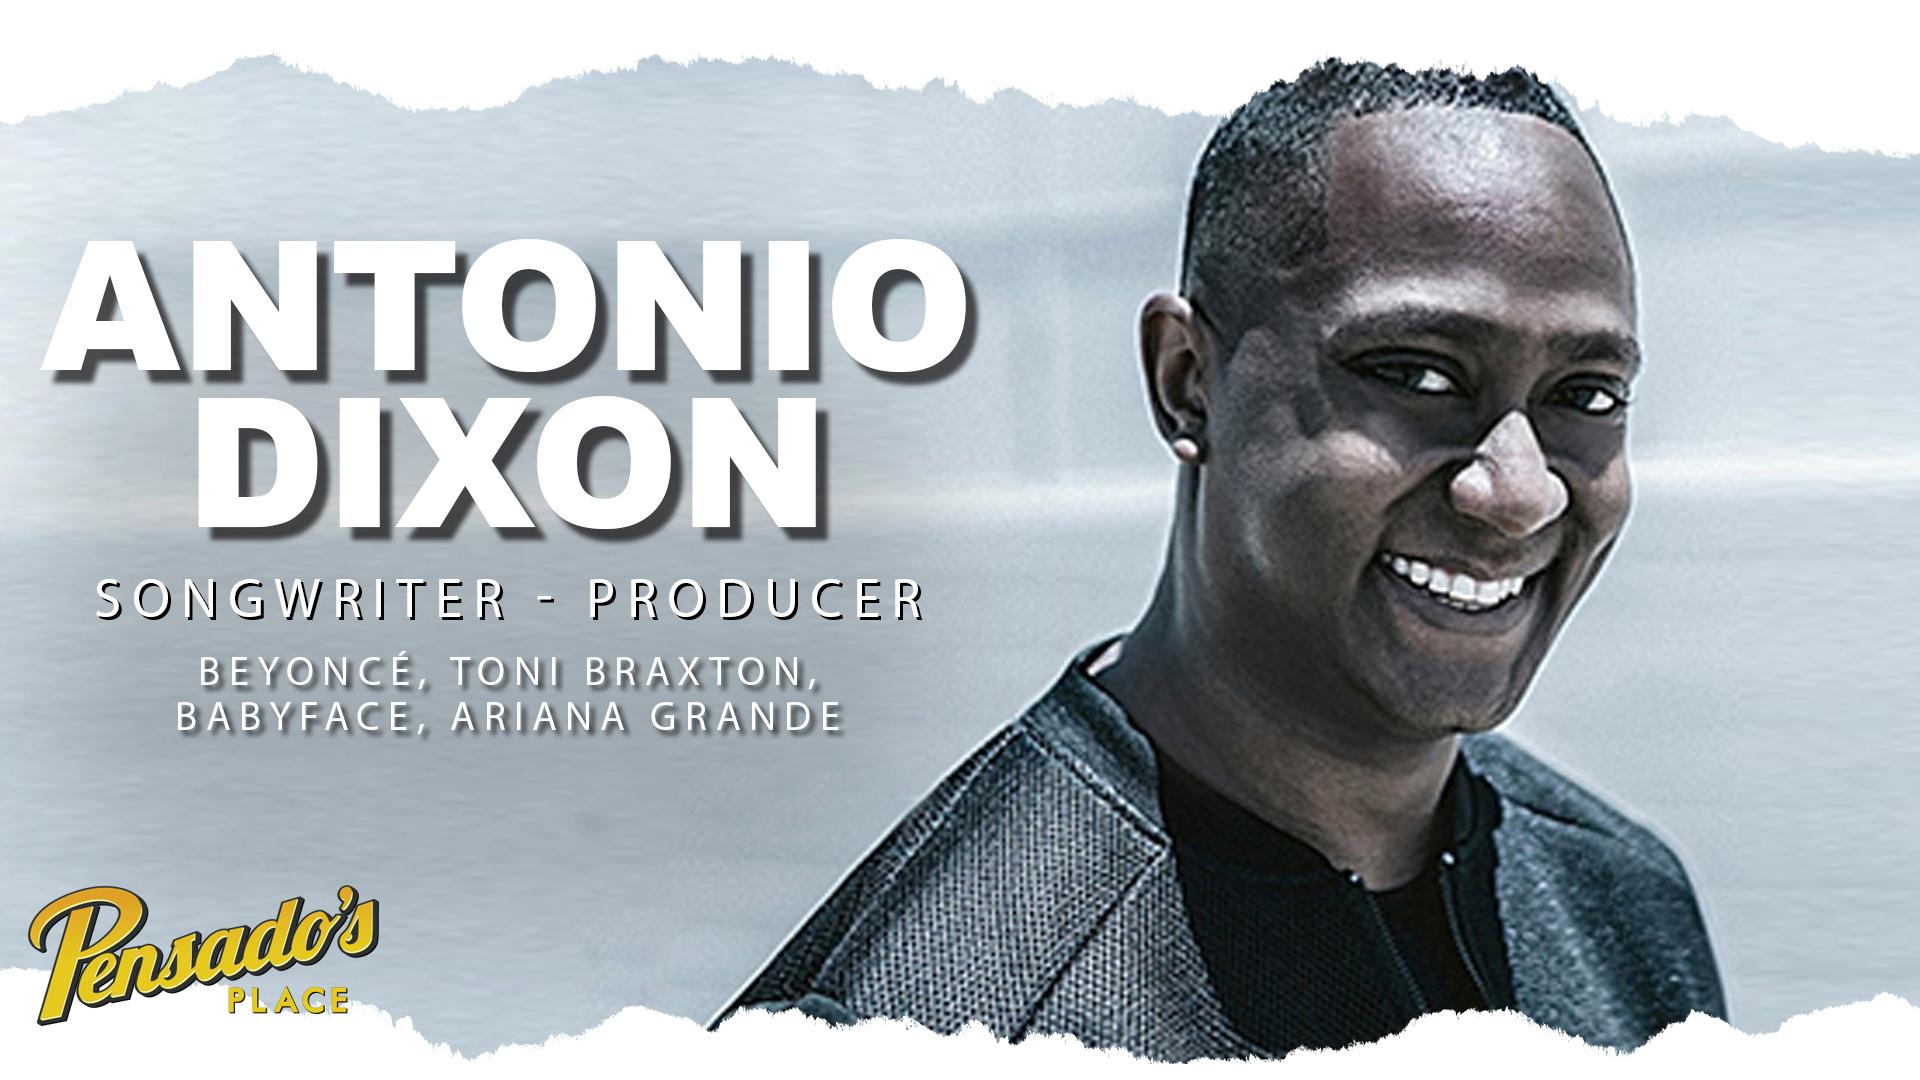 Grammy Award Winning Producer / Songwriter, Antonio Dixon